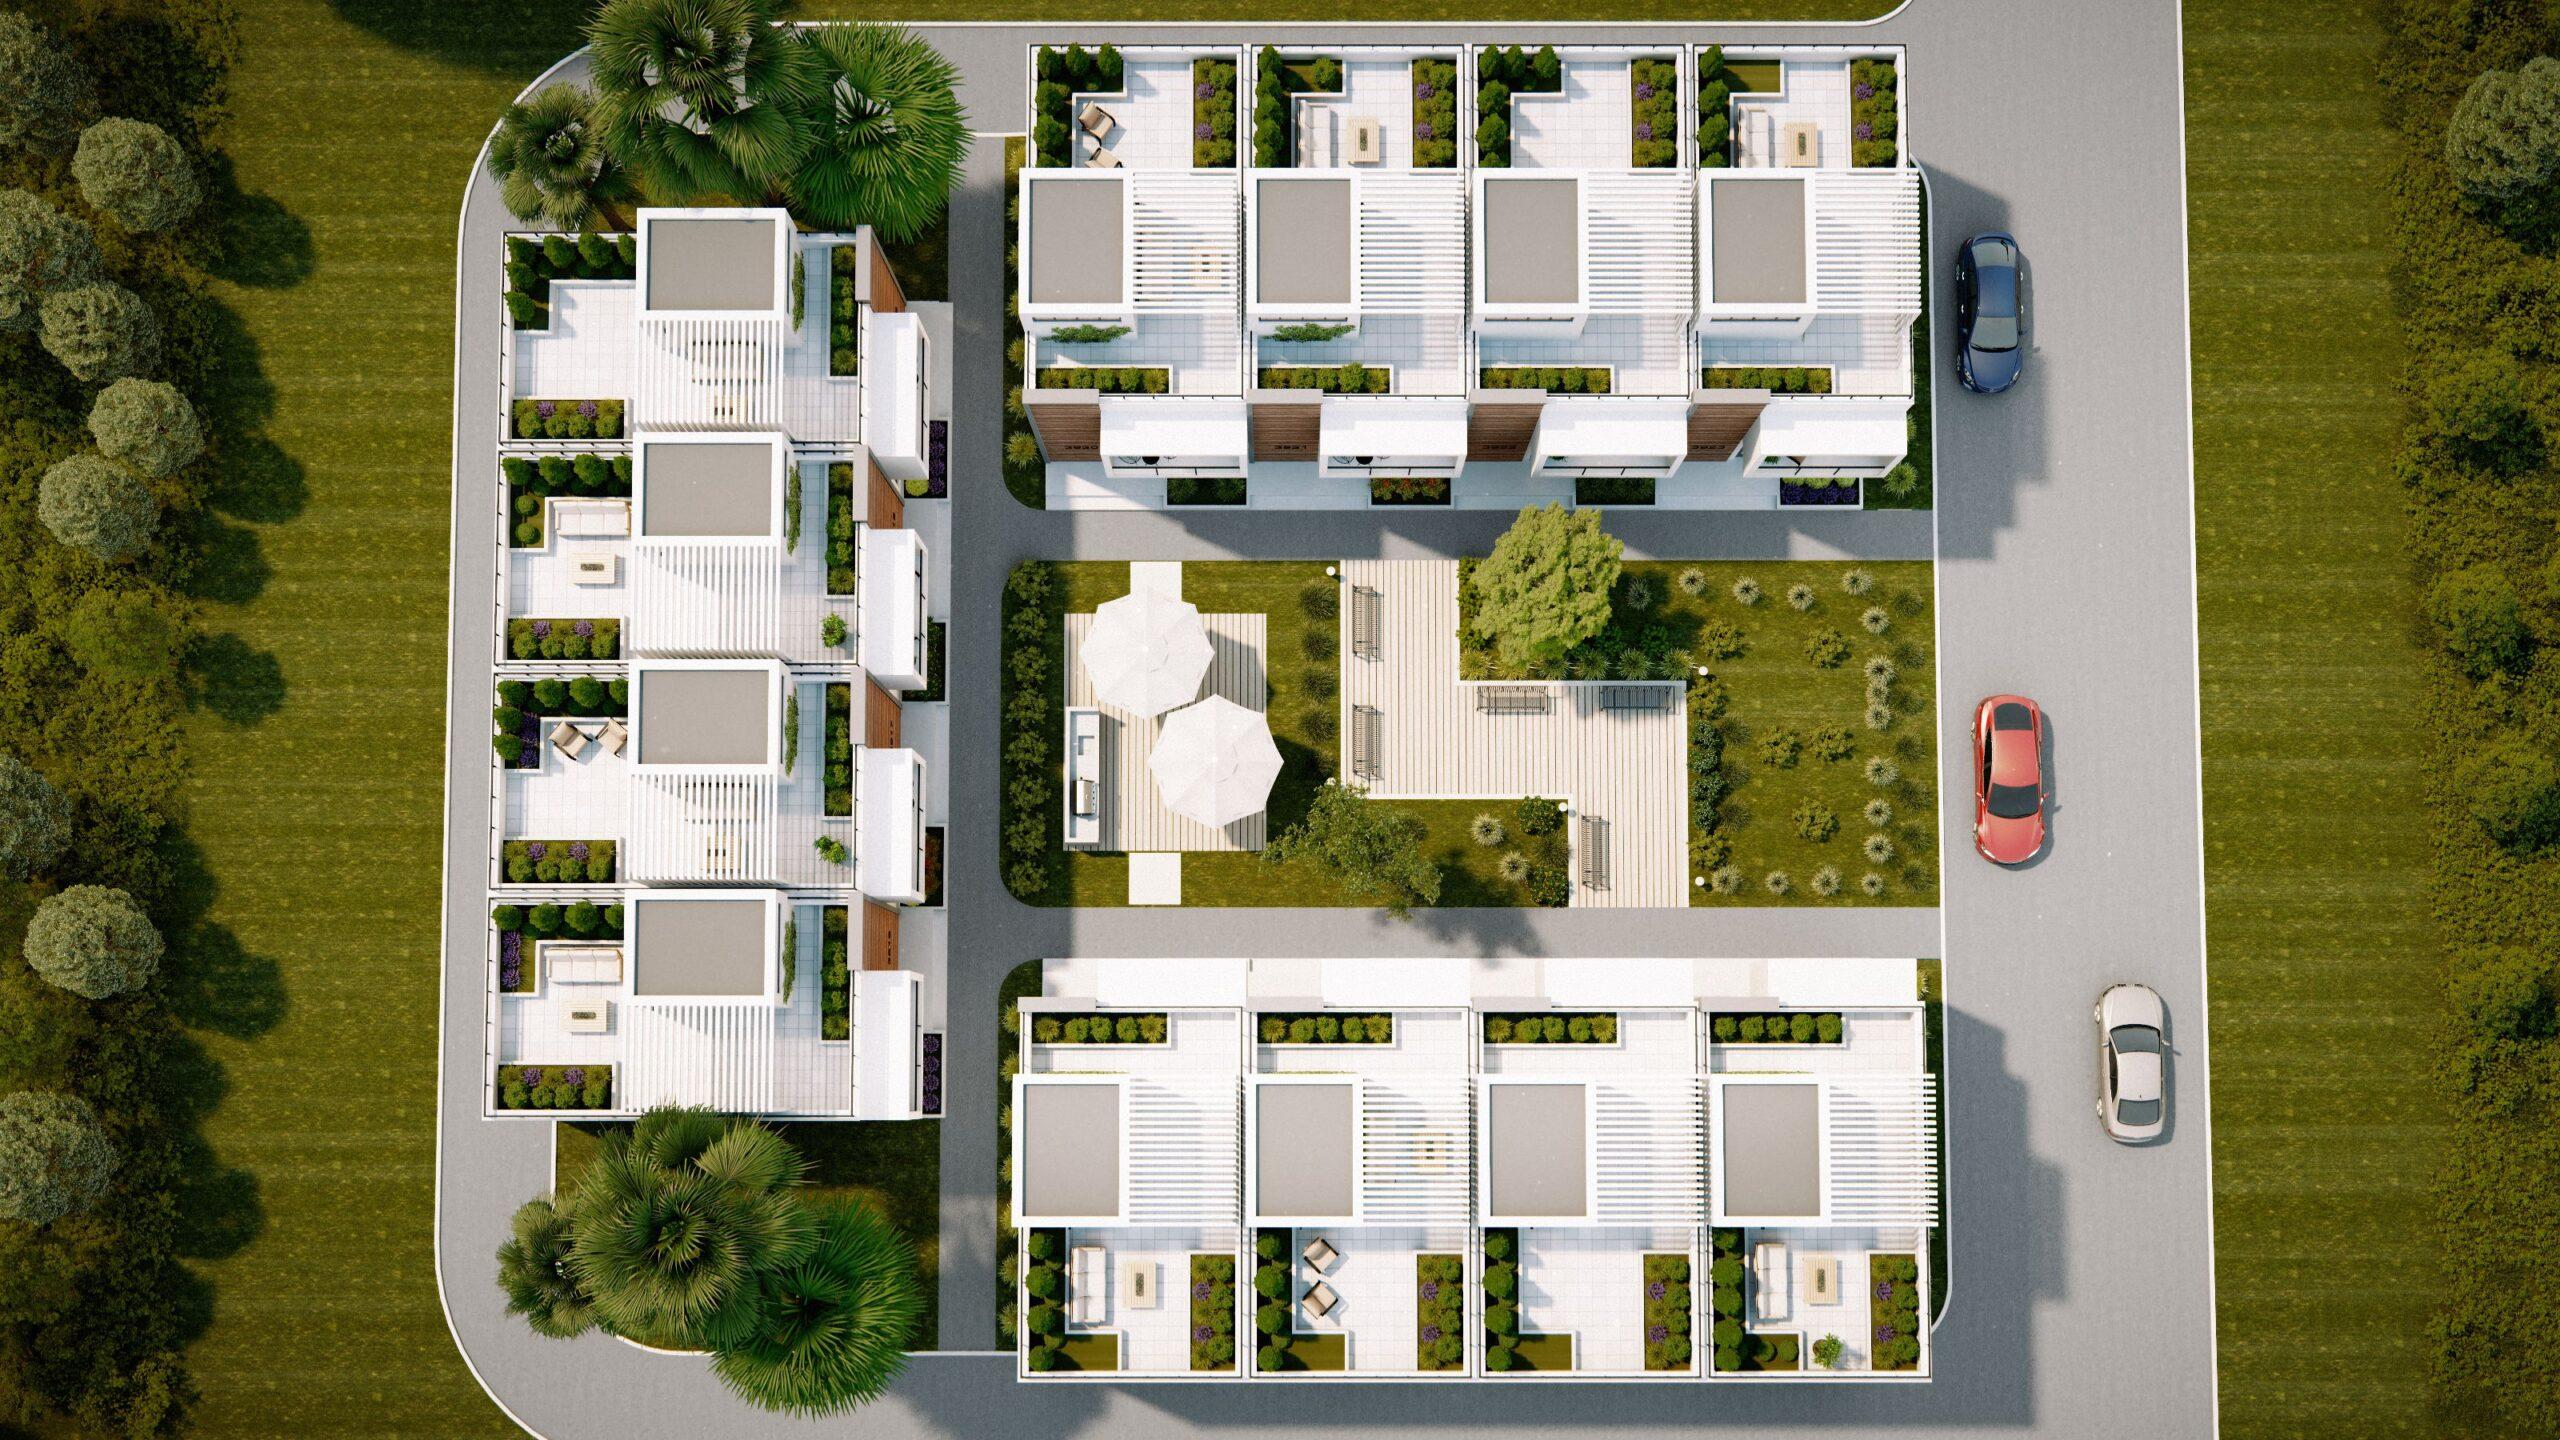 Shirley Ave Site Plot Plan